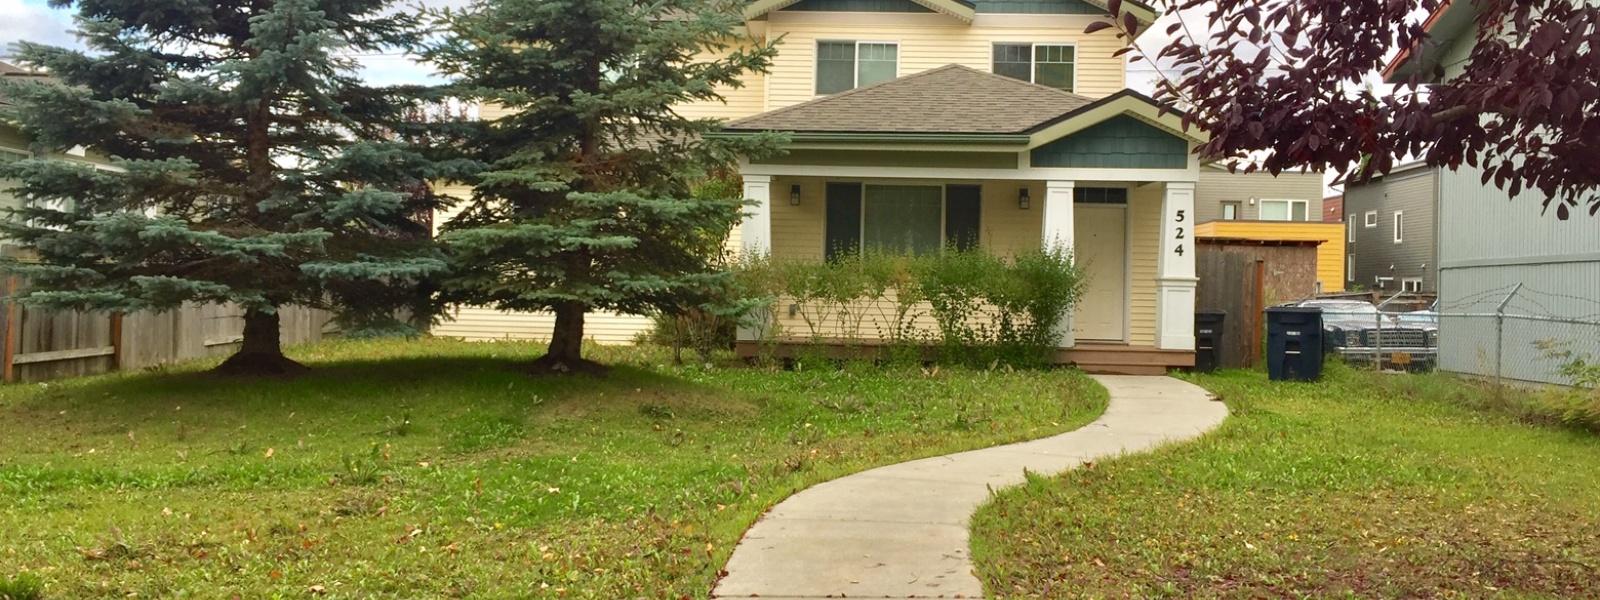 185 Ridgeline Loop, Anchorage, Alaska, 99501, 3 Bedrooms Bedrooms, ,1.5 BathroomsBathrooms,Single Family,For Rent,Ridgeline Loop,1041